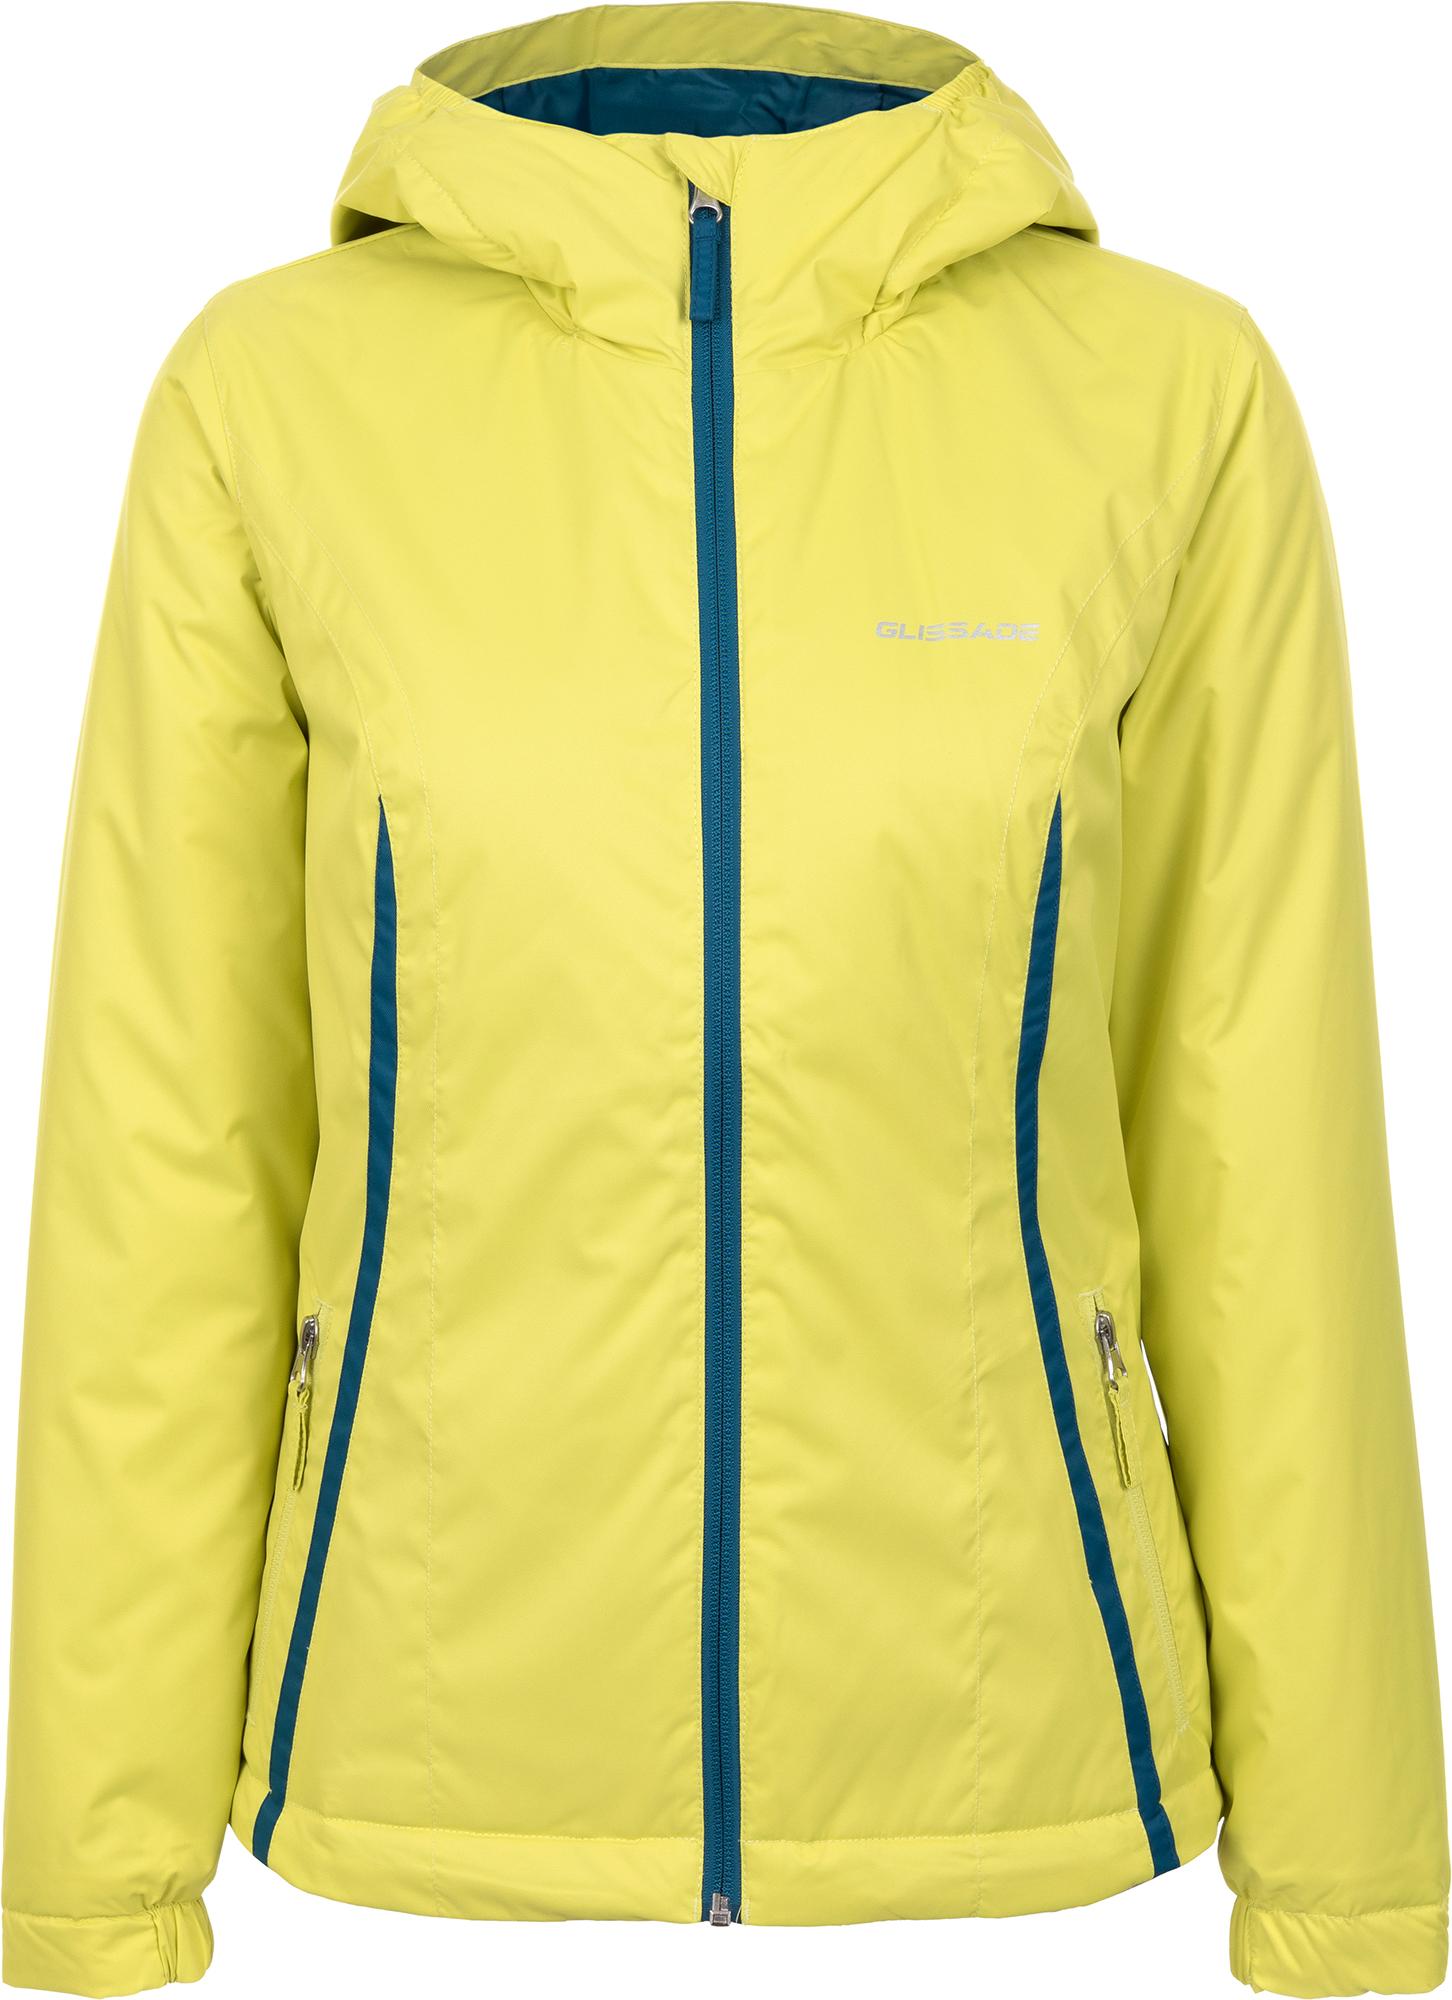 Glissade Куртка утепленная женская , размер 56